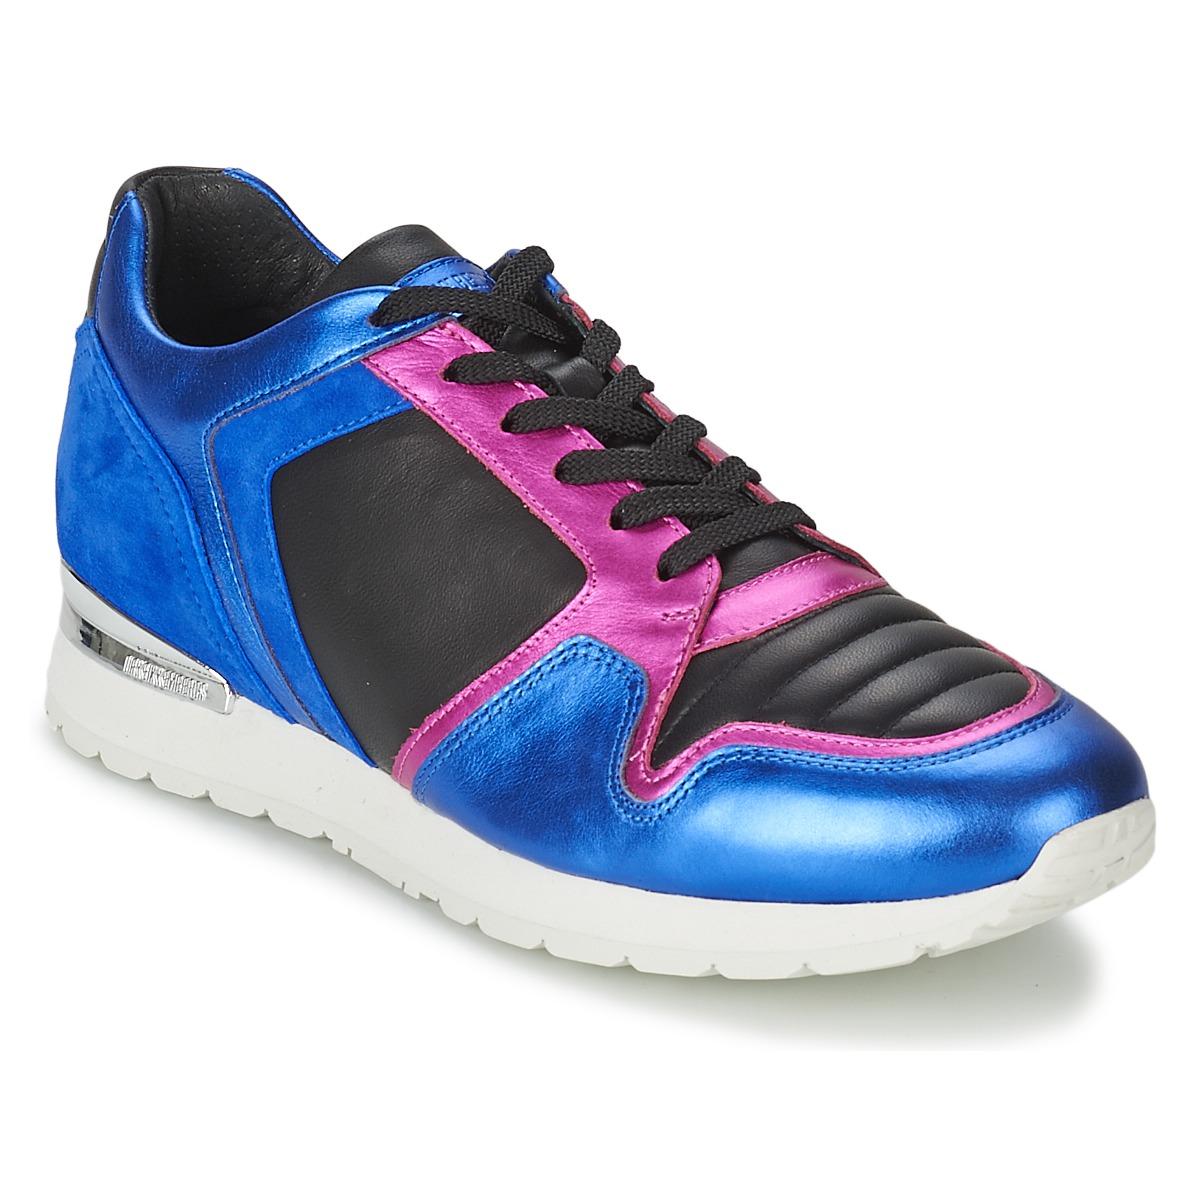 Bikkembergs KATE 420 Blau - Kostenloser Versand bei Spartoode ! - Schuhe Sneaker Low Damen 112,50 €